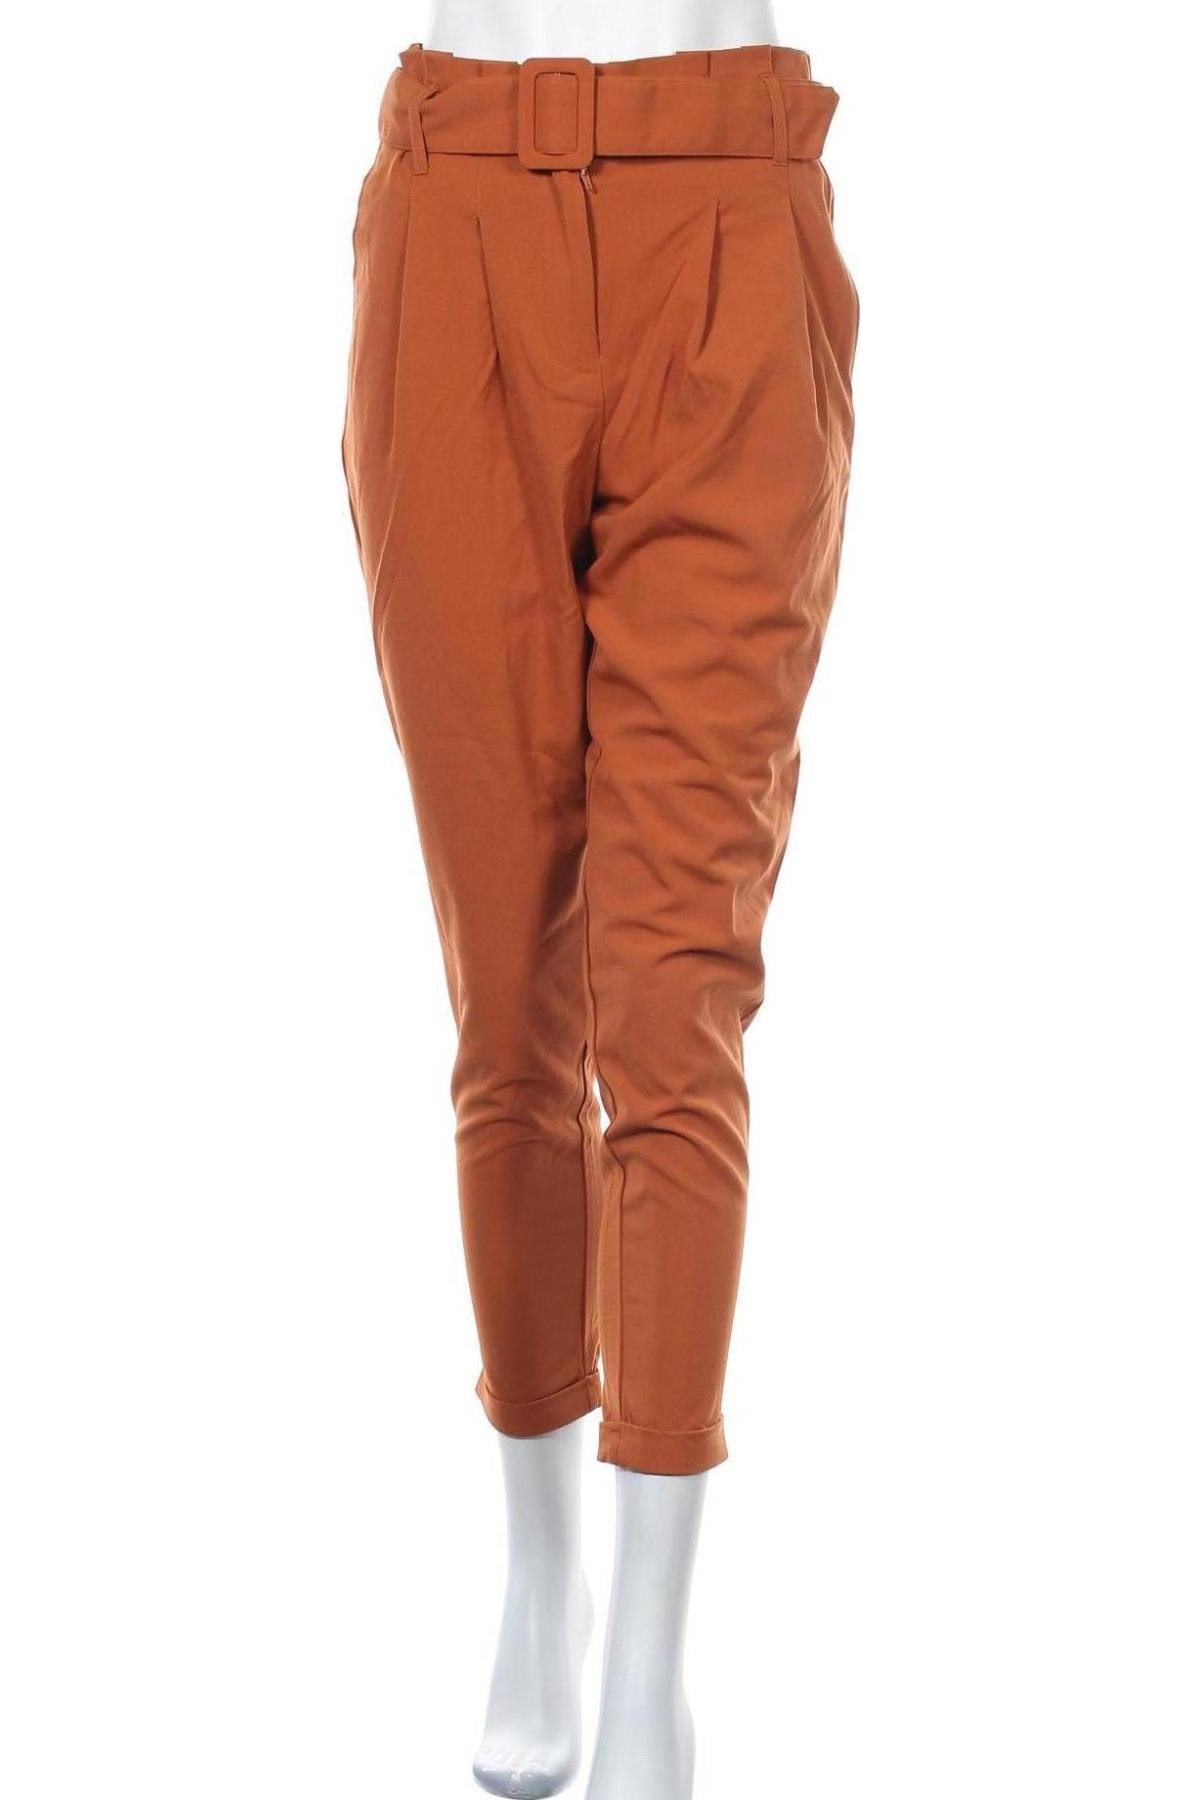 Дамски панталон ONLY, Размер S, Цвят Кафяв, 63% полиестер, 33% вискоза, 4% еластан, Цена 17,22лв.